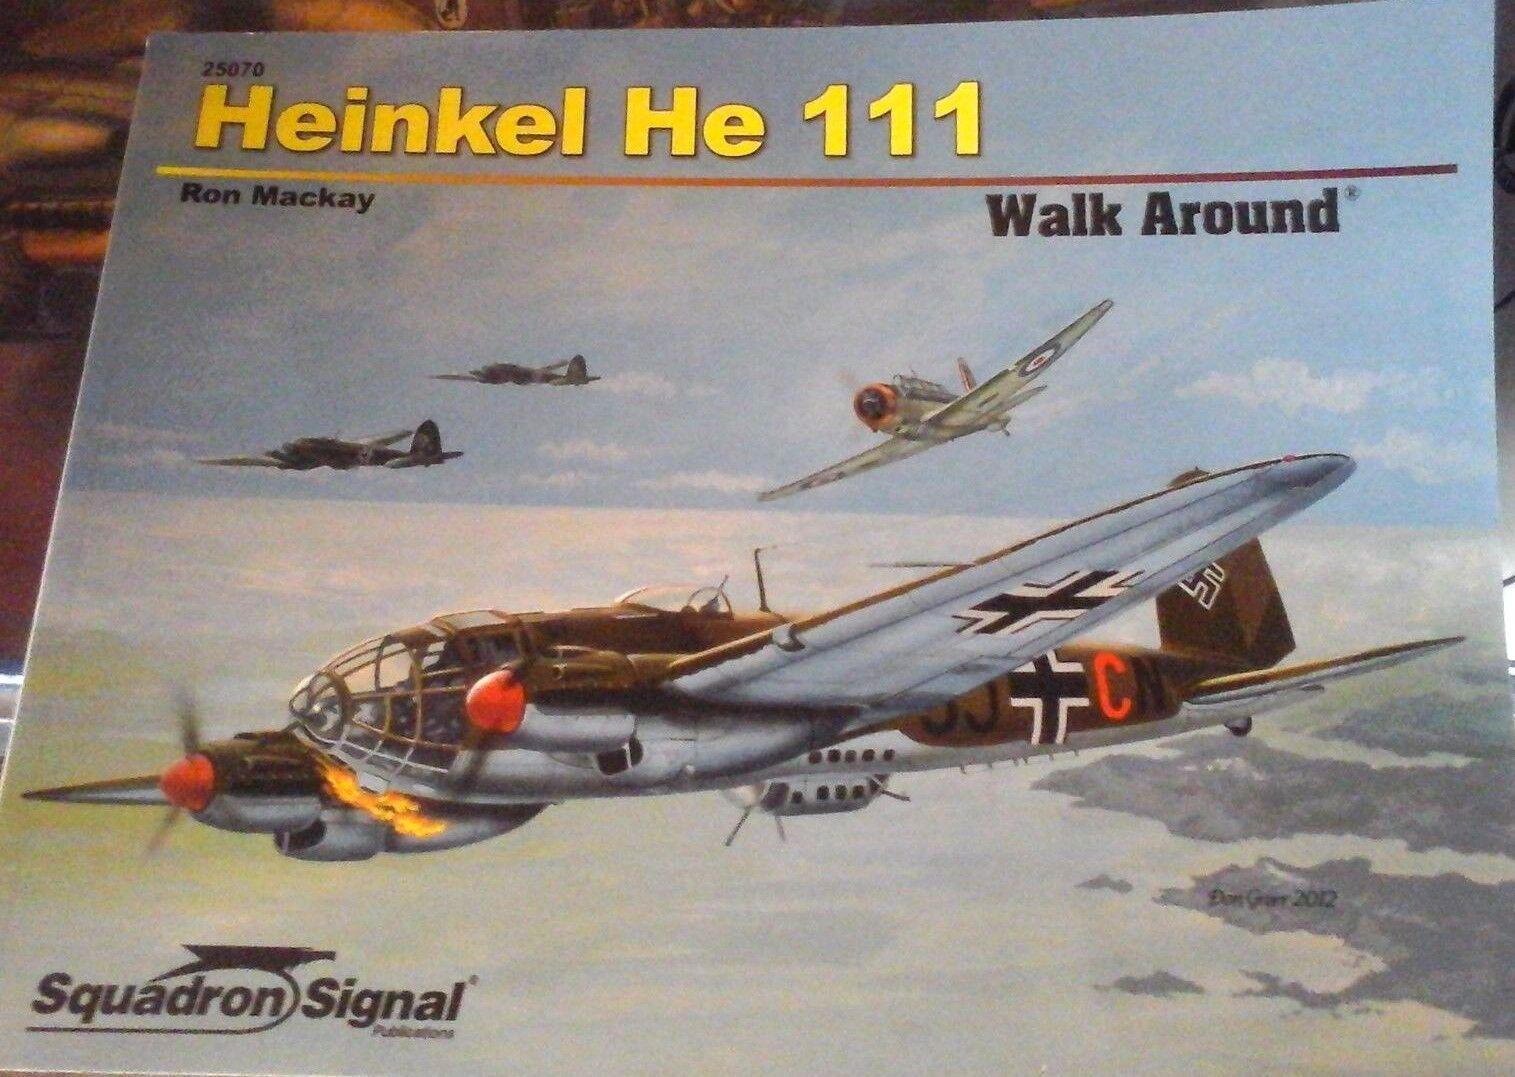 Squadron SIGNAL WALK AROUND n.25070  Heinkel HE 111 -by Ron mackay